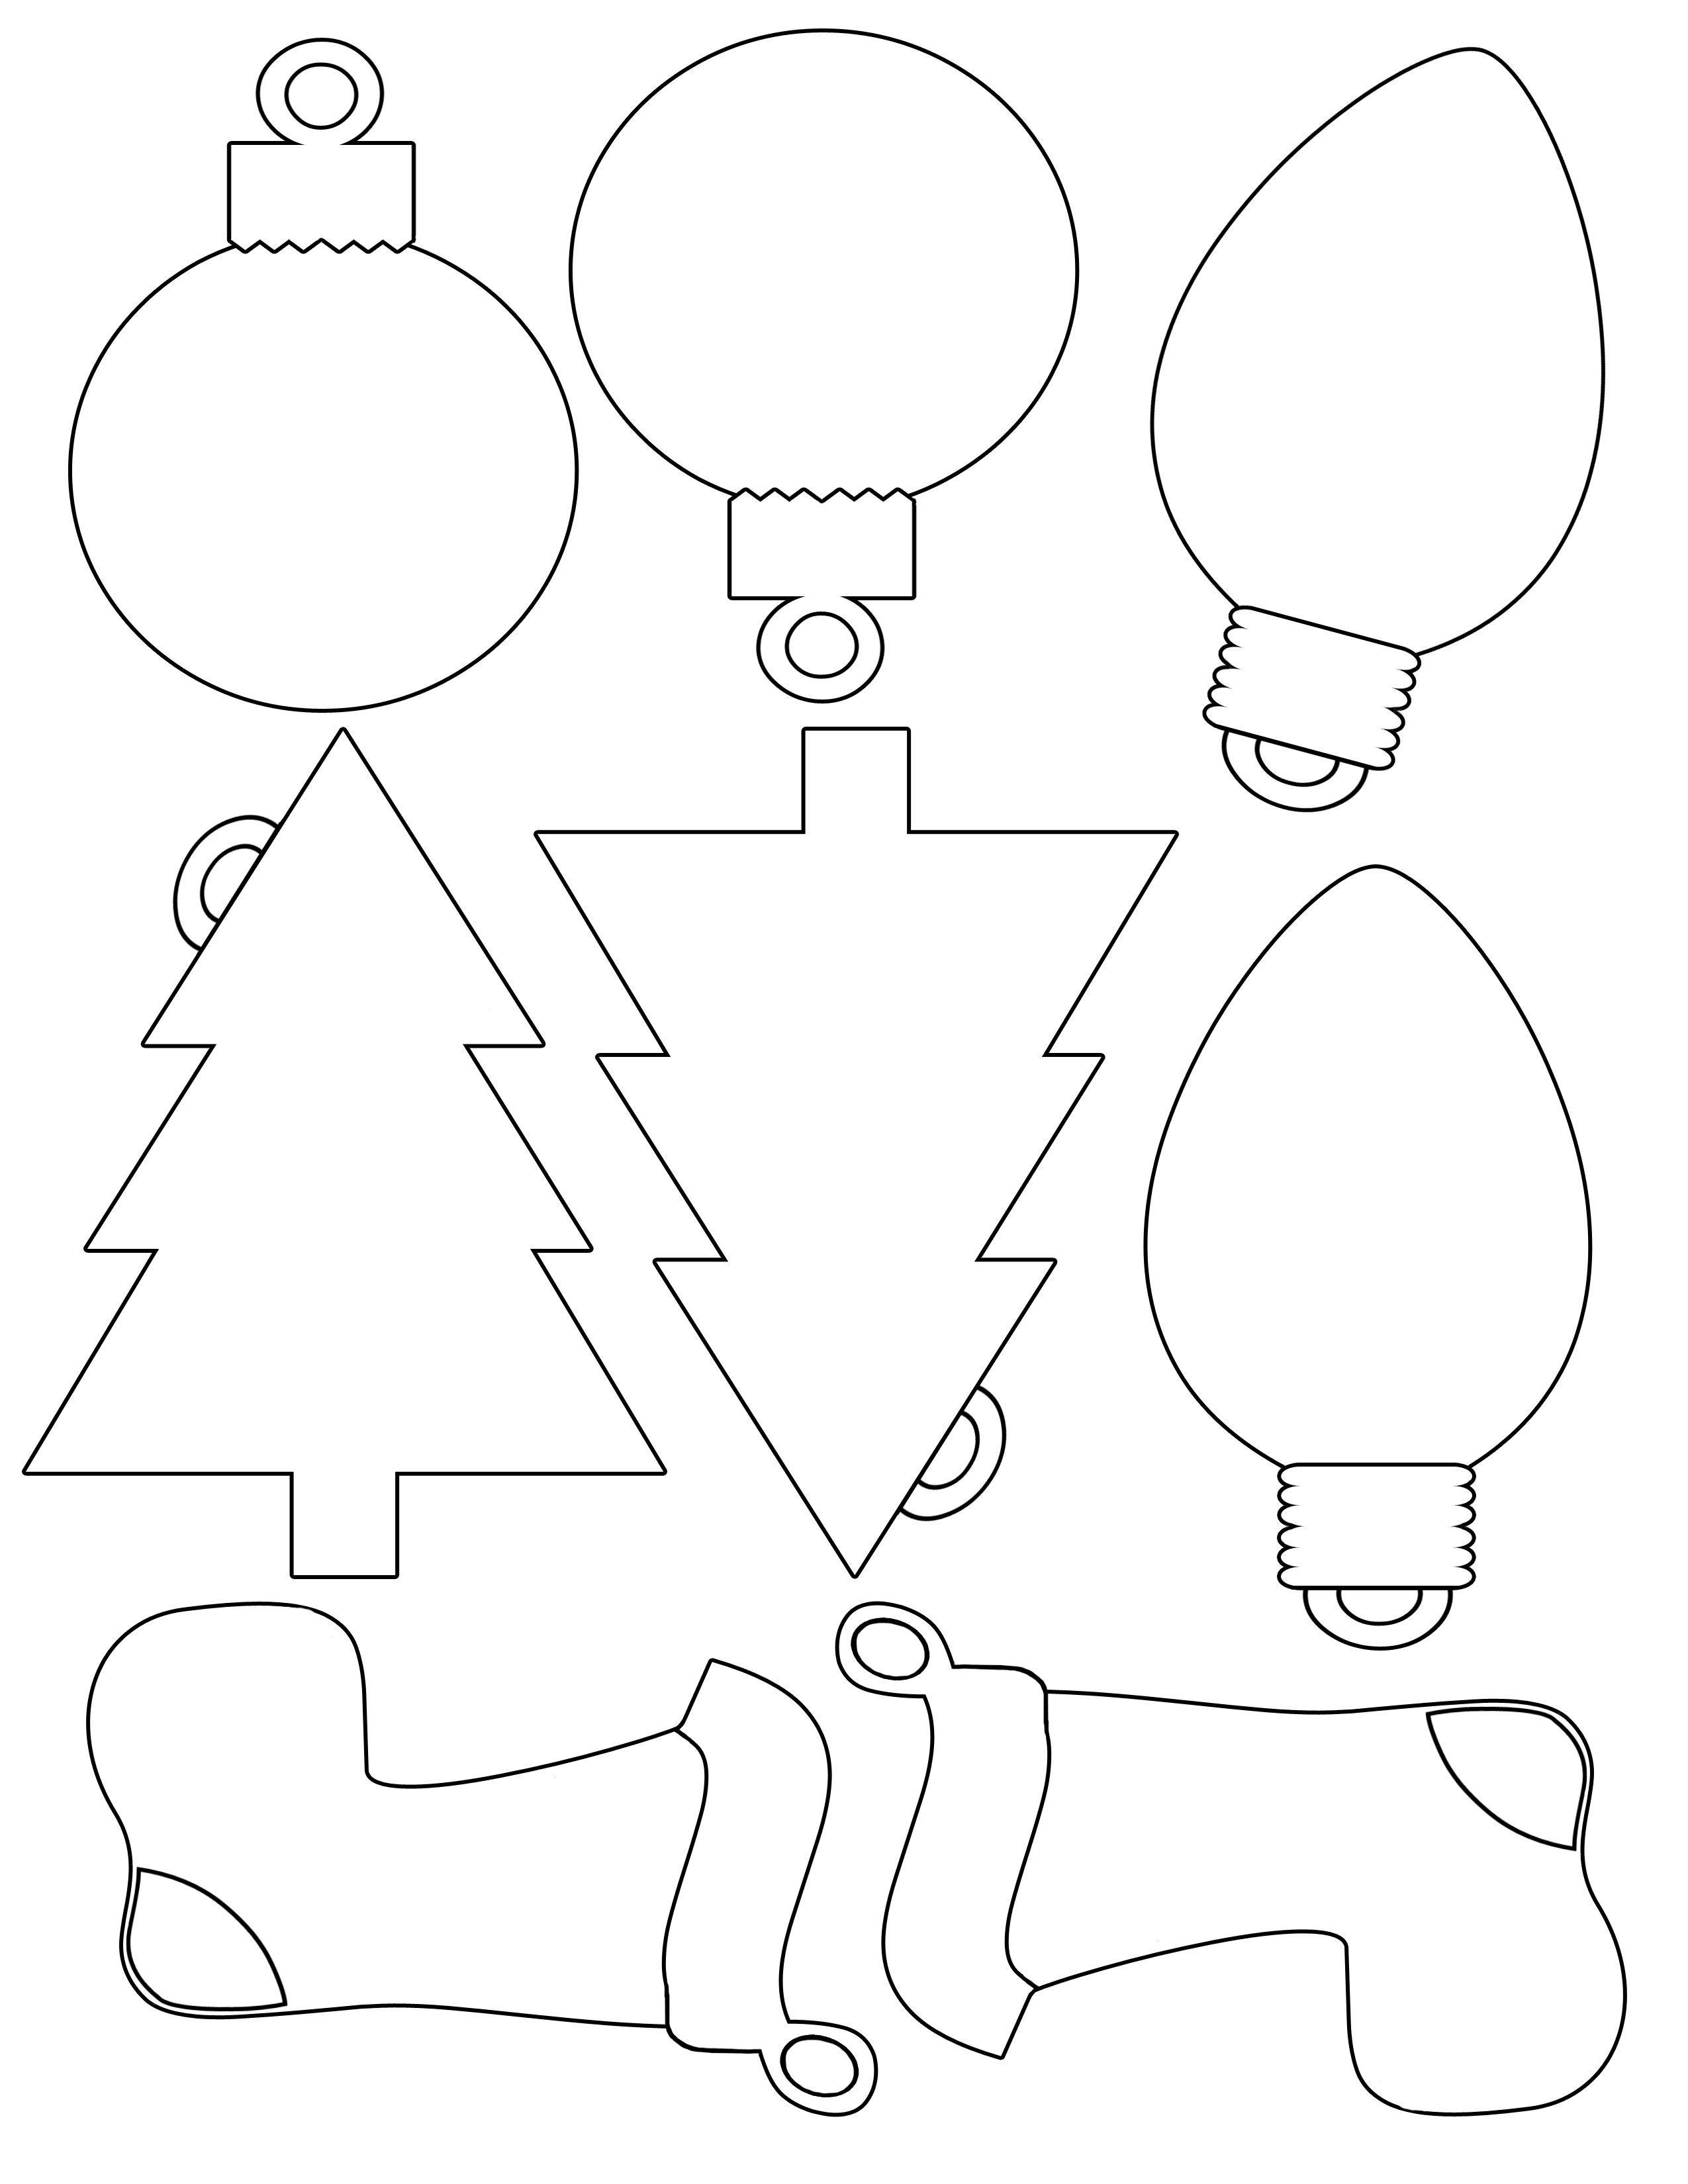 005 Shocking Printable Christma Ornament Template Picture  Templates Stencil Felt Pattern TreeFull